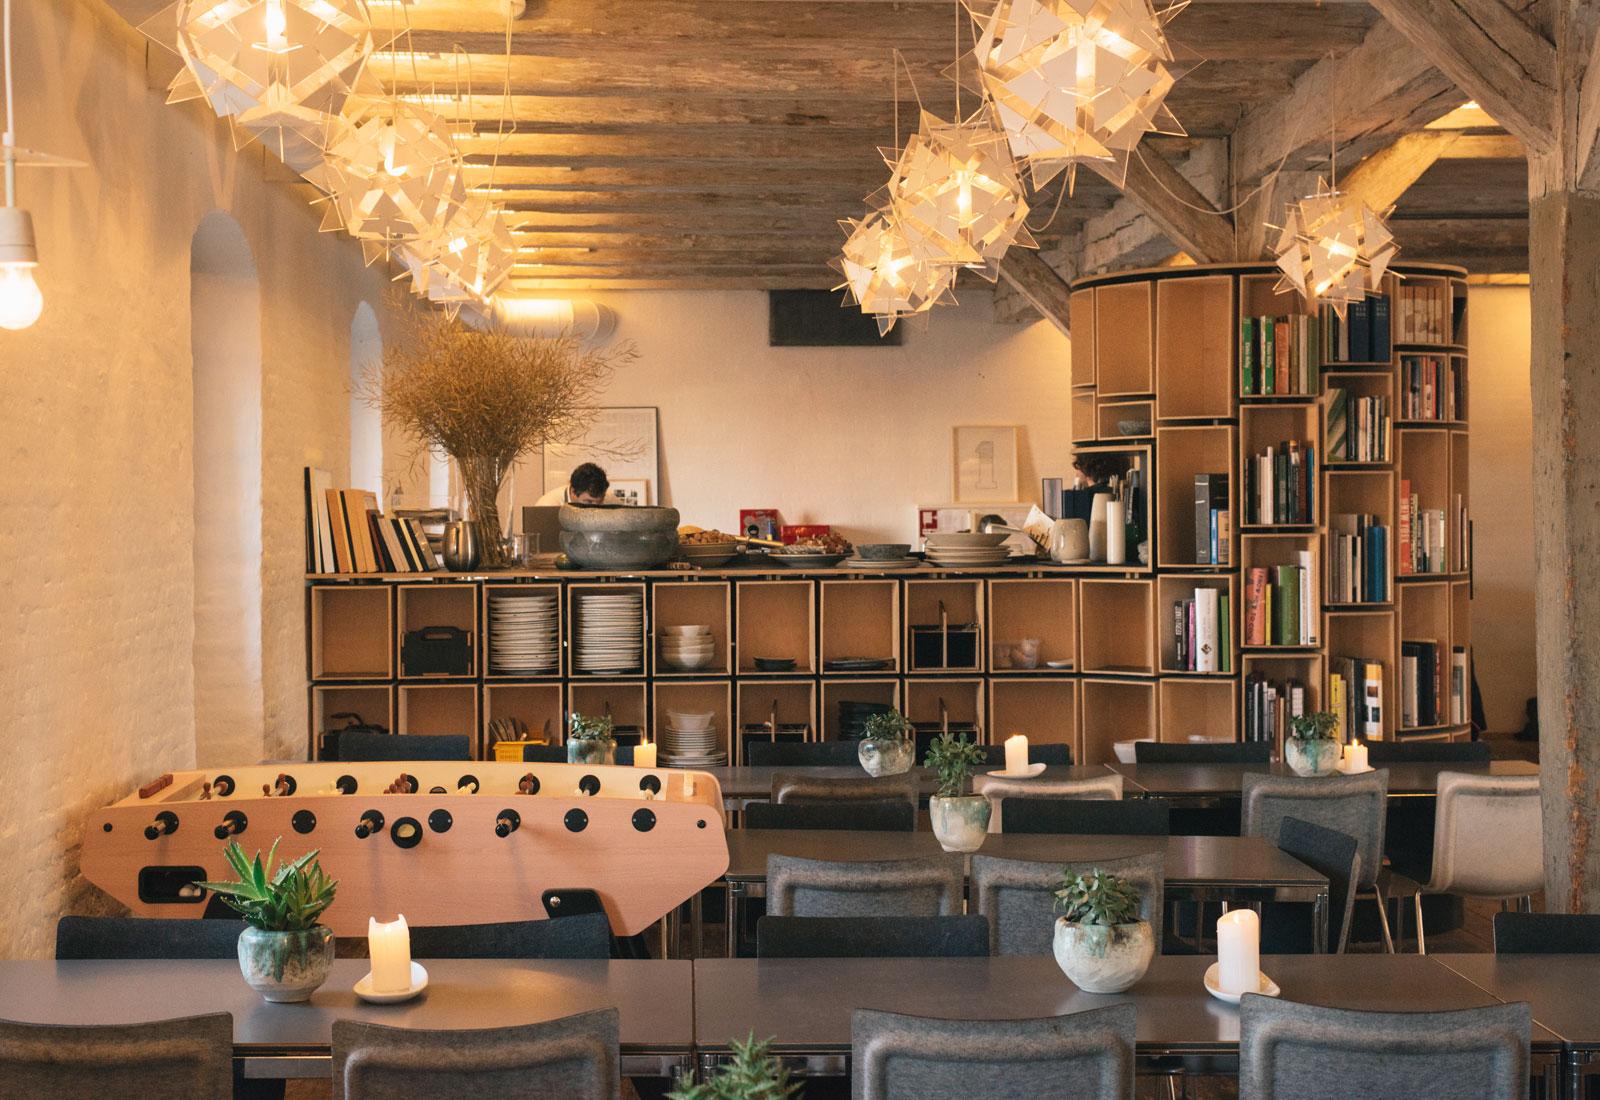 top 5 emerging fashion cities featuring copenhagen denmark cute restaurant